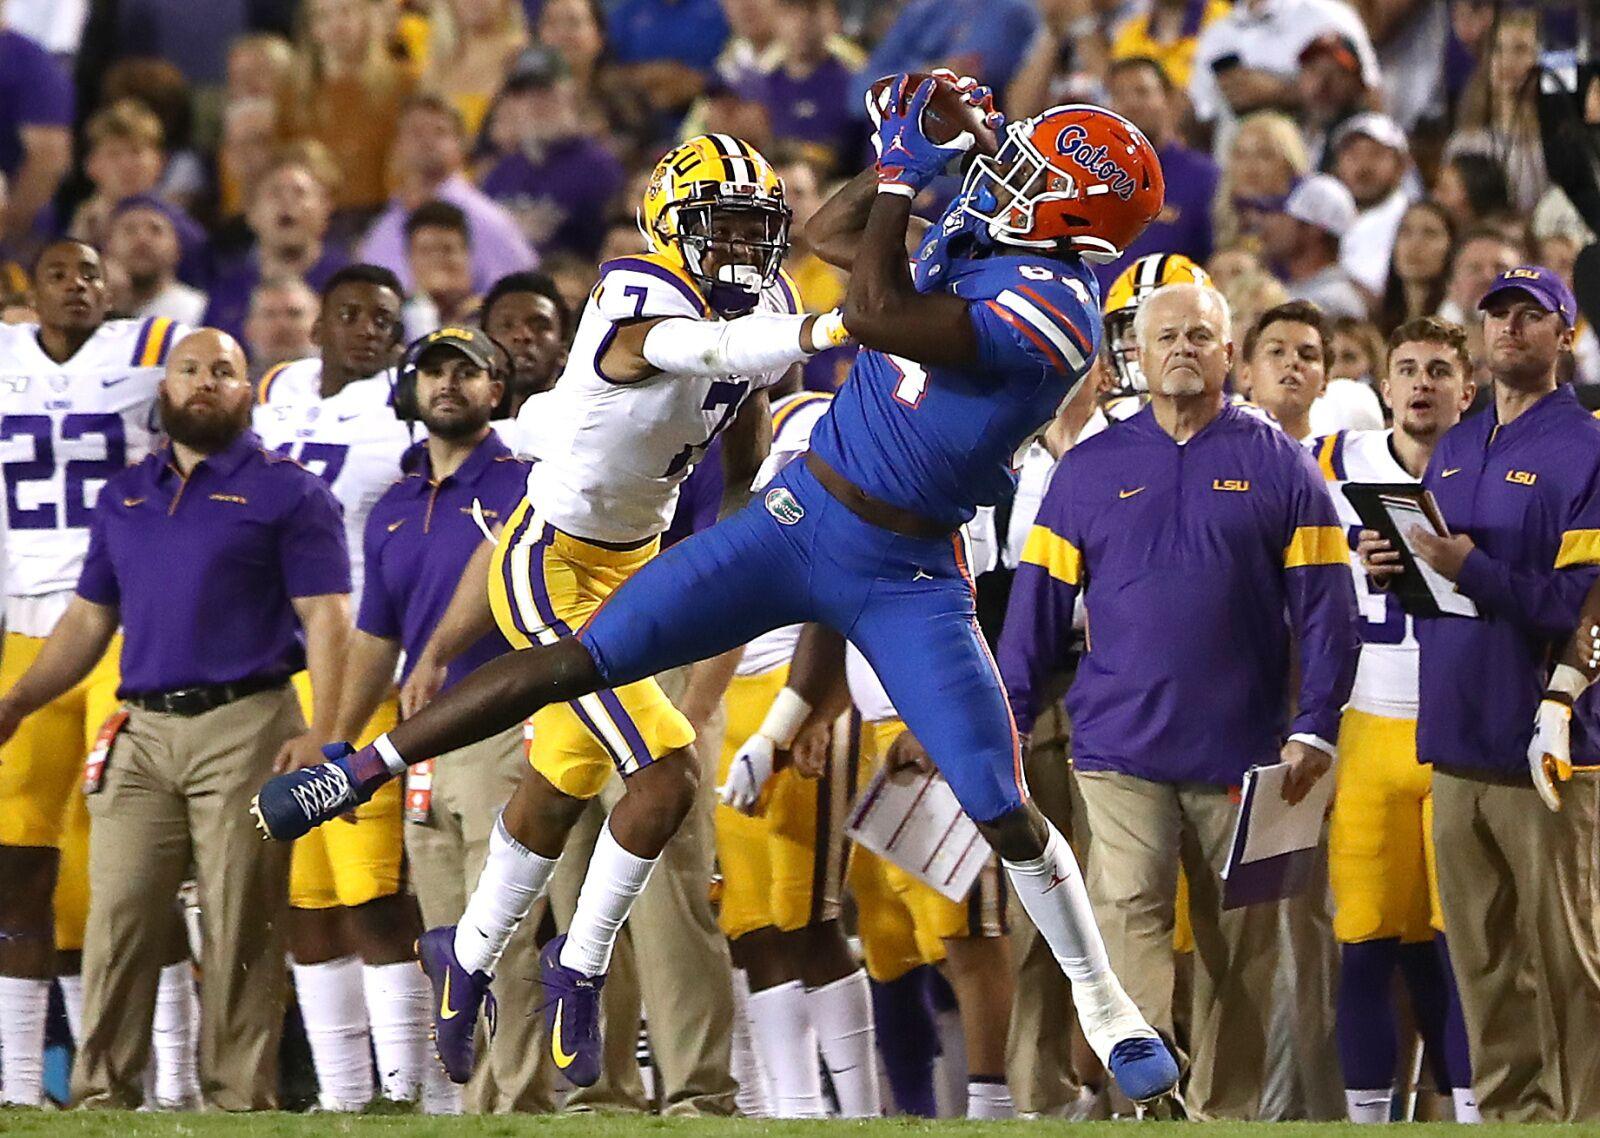 Florida football: Gators injury report ahead of South Carolina